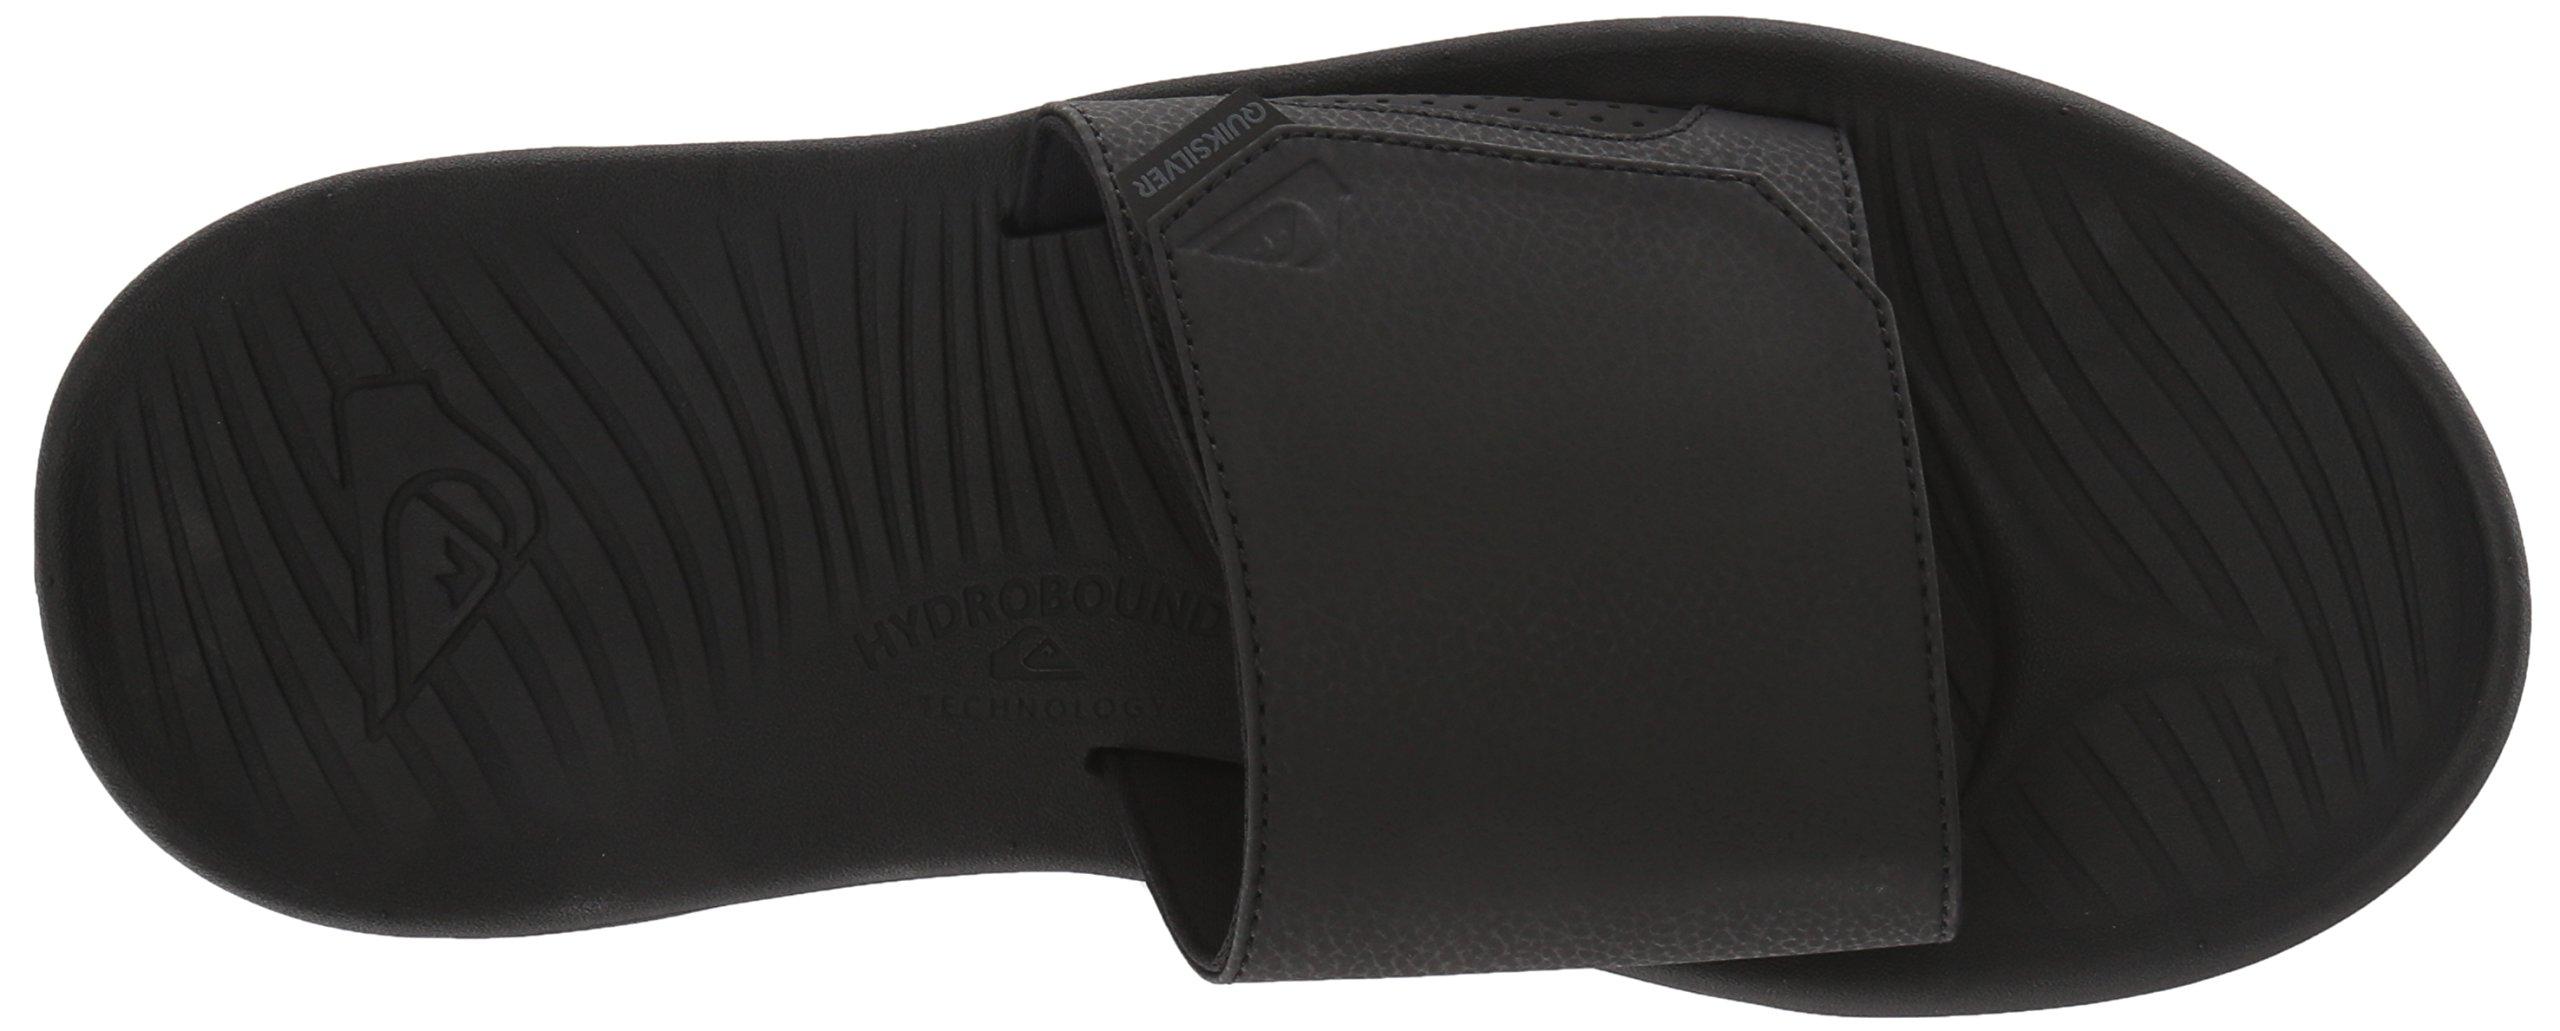 Quiksilver Men's Travel Oasis Slide Sandal, Black/Black/Brown, 8(41) M US by Quiksilver (Image #7)